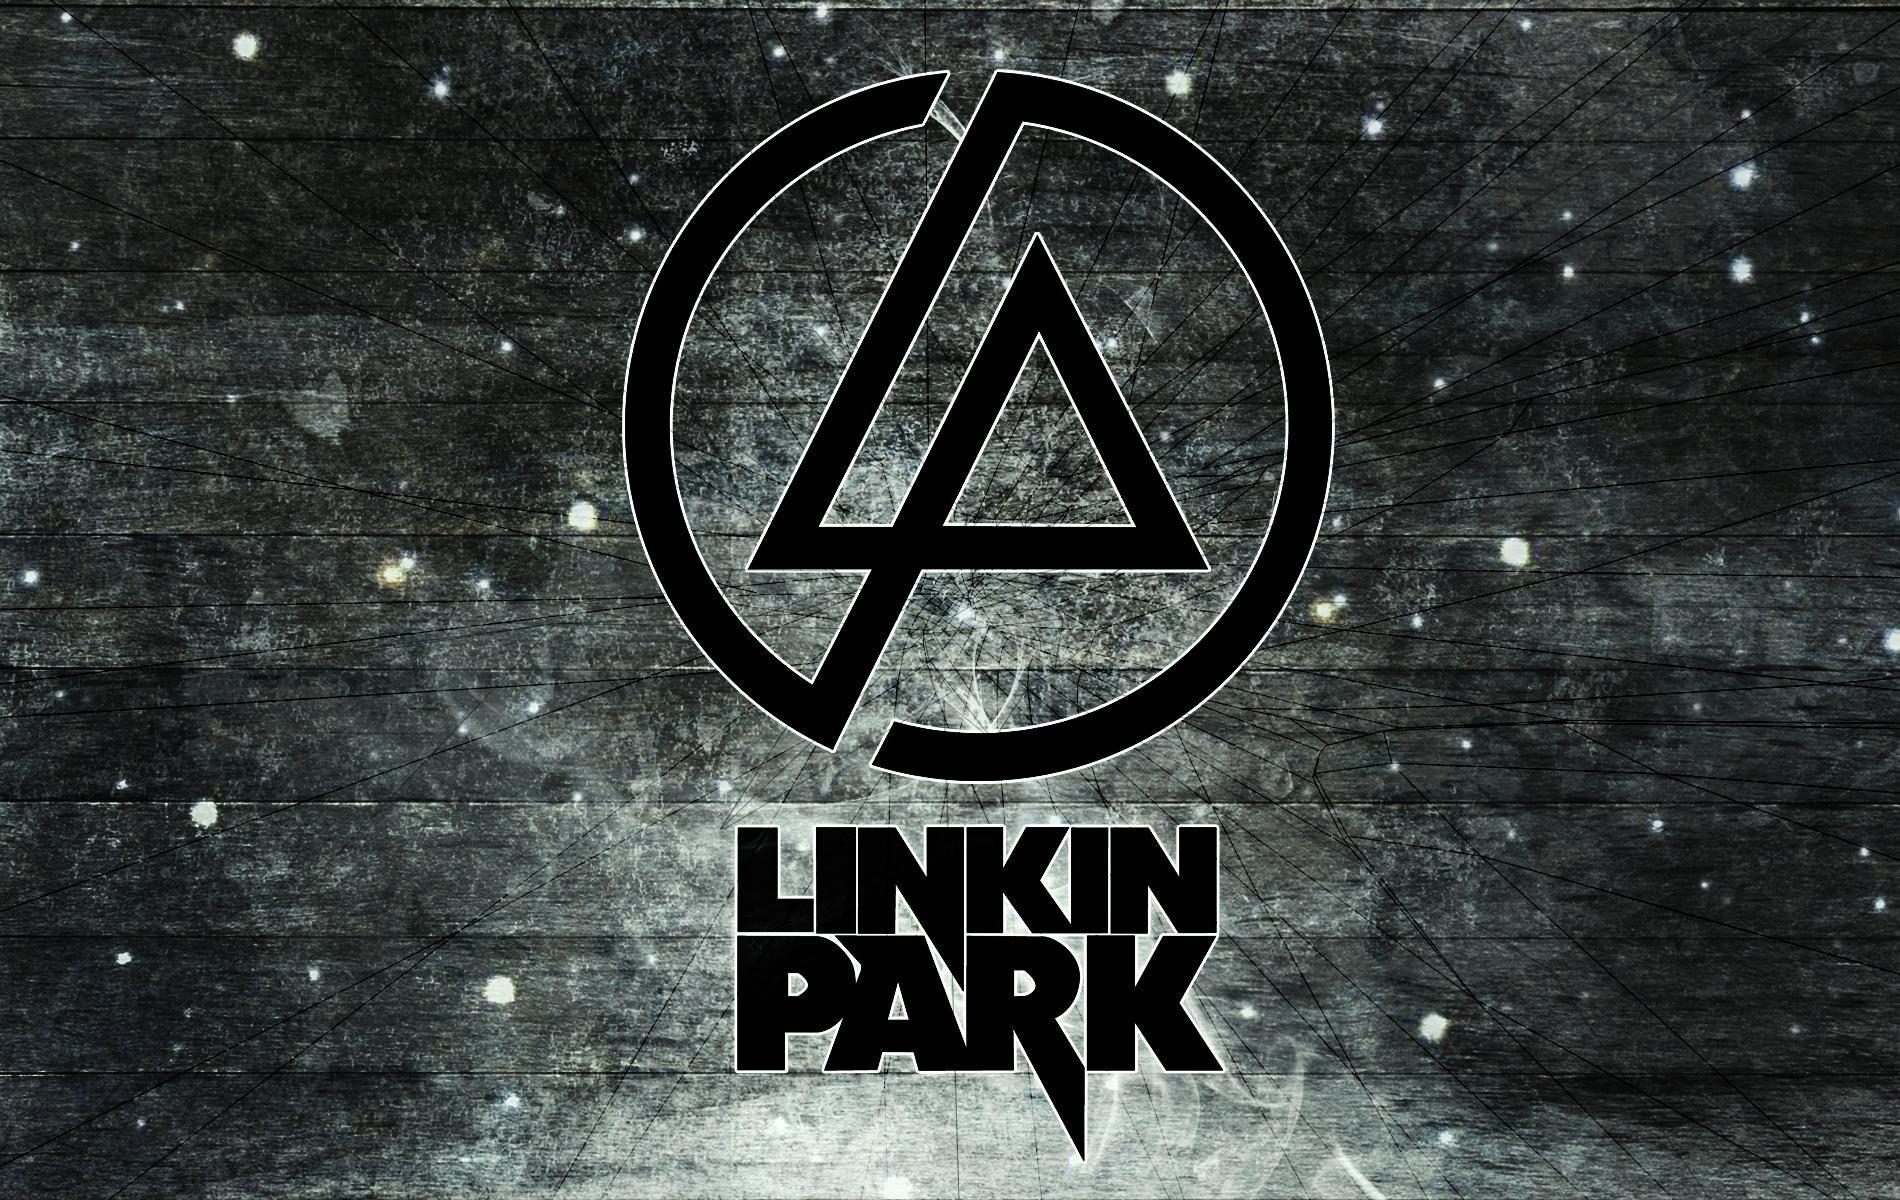 Wallpaper iphone linkin park - Wallpaper Linkin Park By Mctaylis On Deviantart Hd Wallpapers Pinterest Linkin Park And Wallpaper